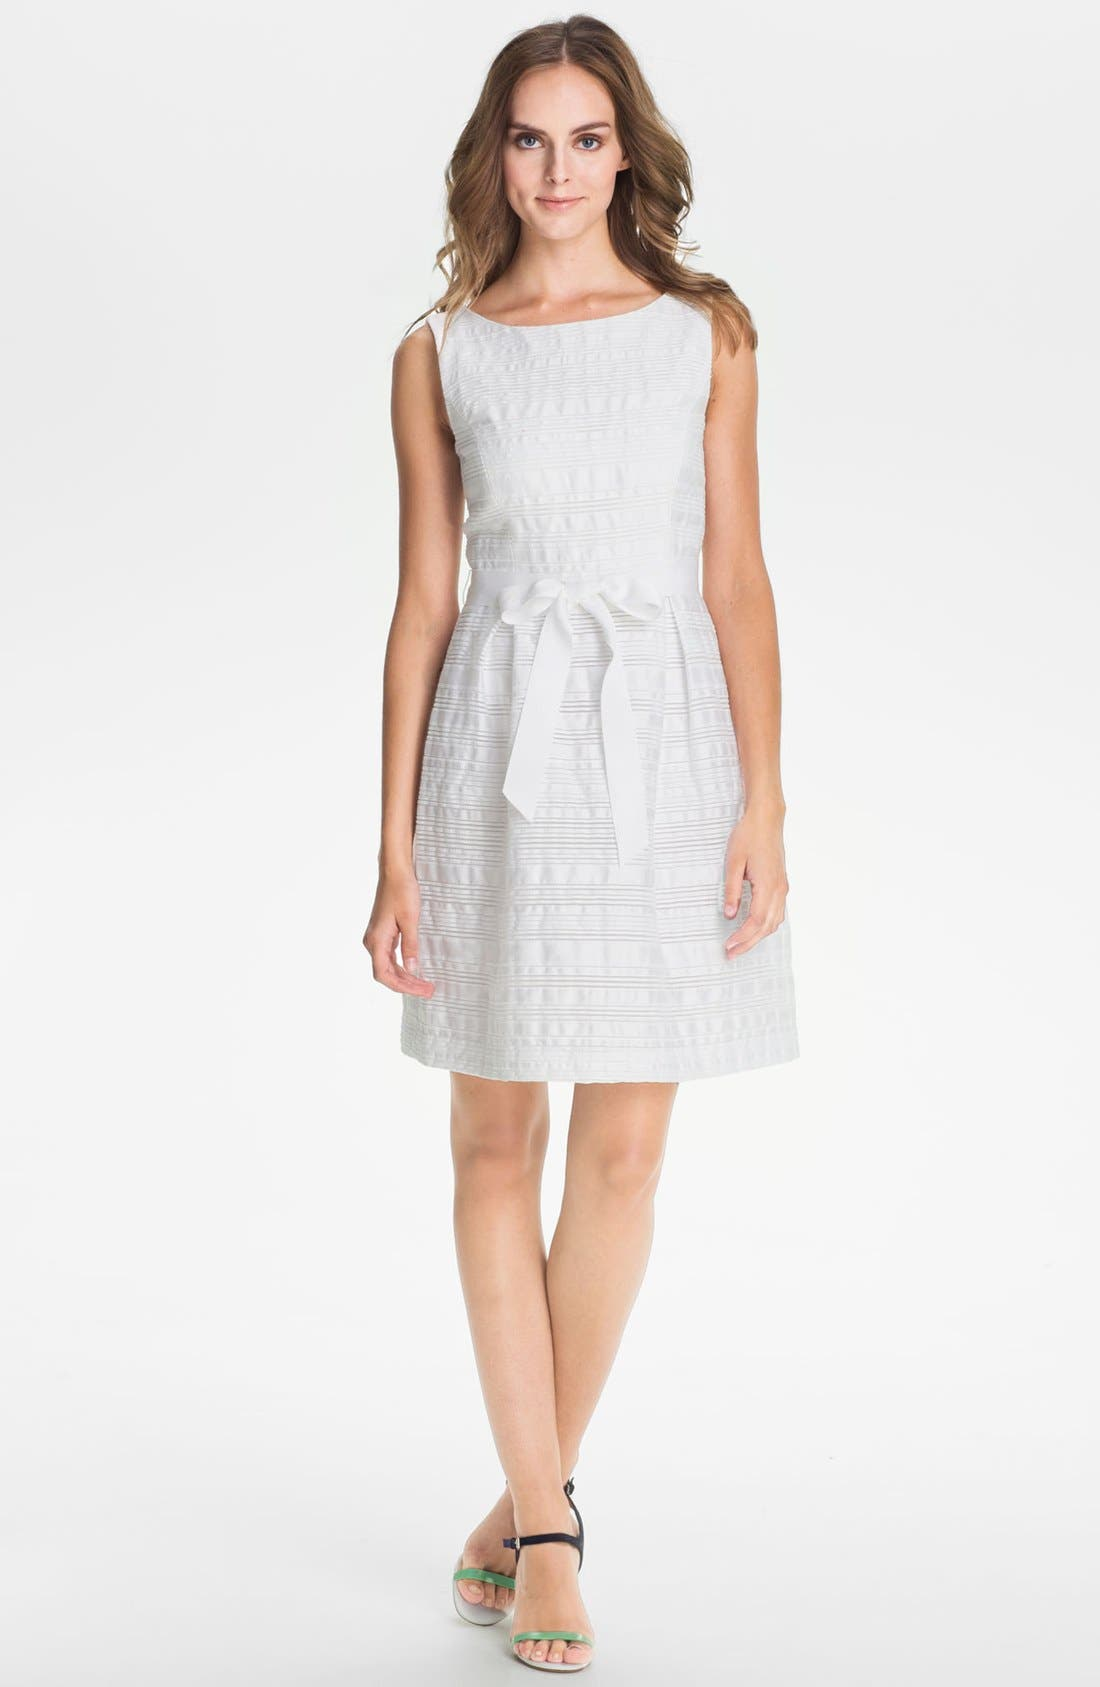 Alternate Image 1 Selected - Trina Turk 'Fru Fru' Stripe Fit & Flare Dress